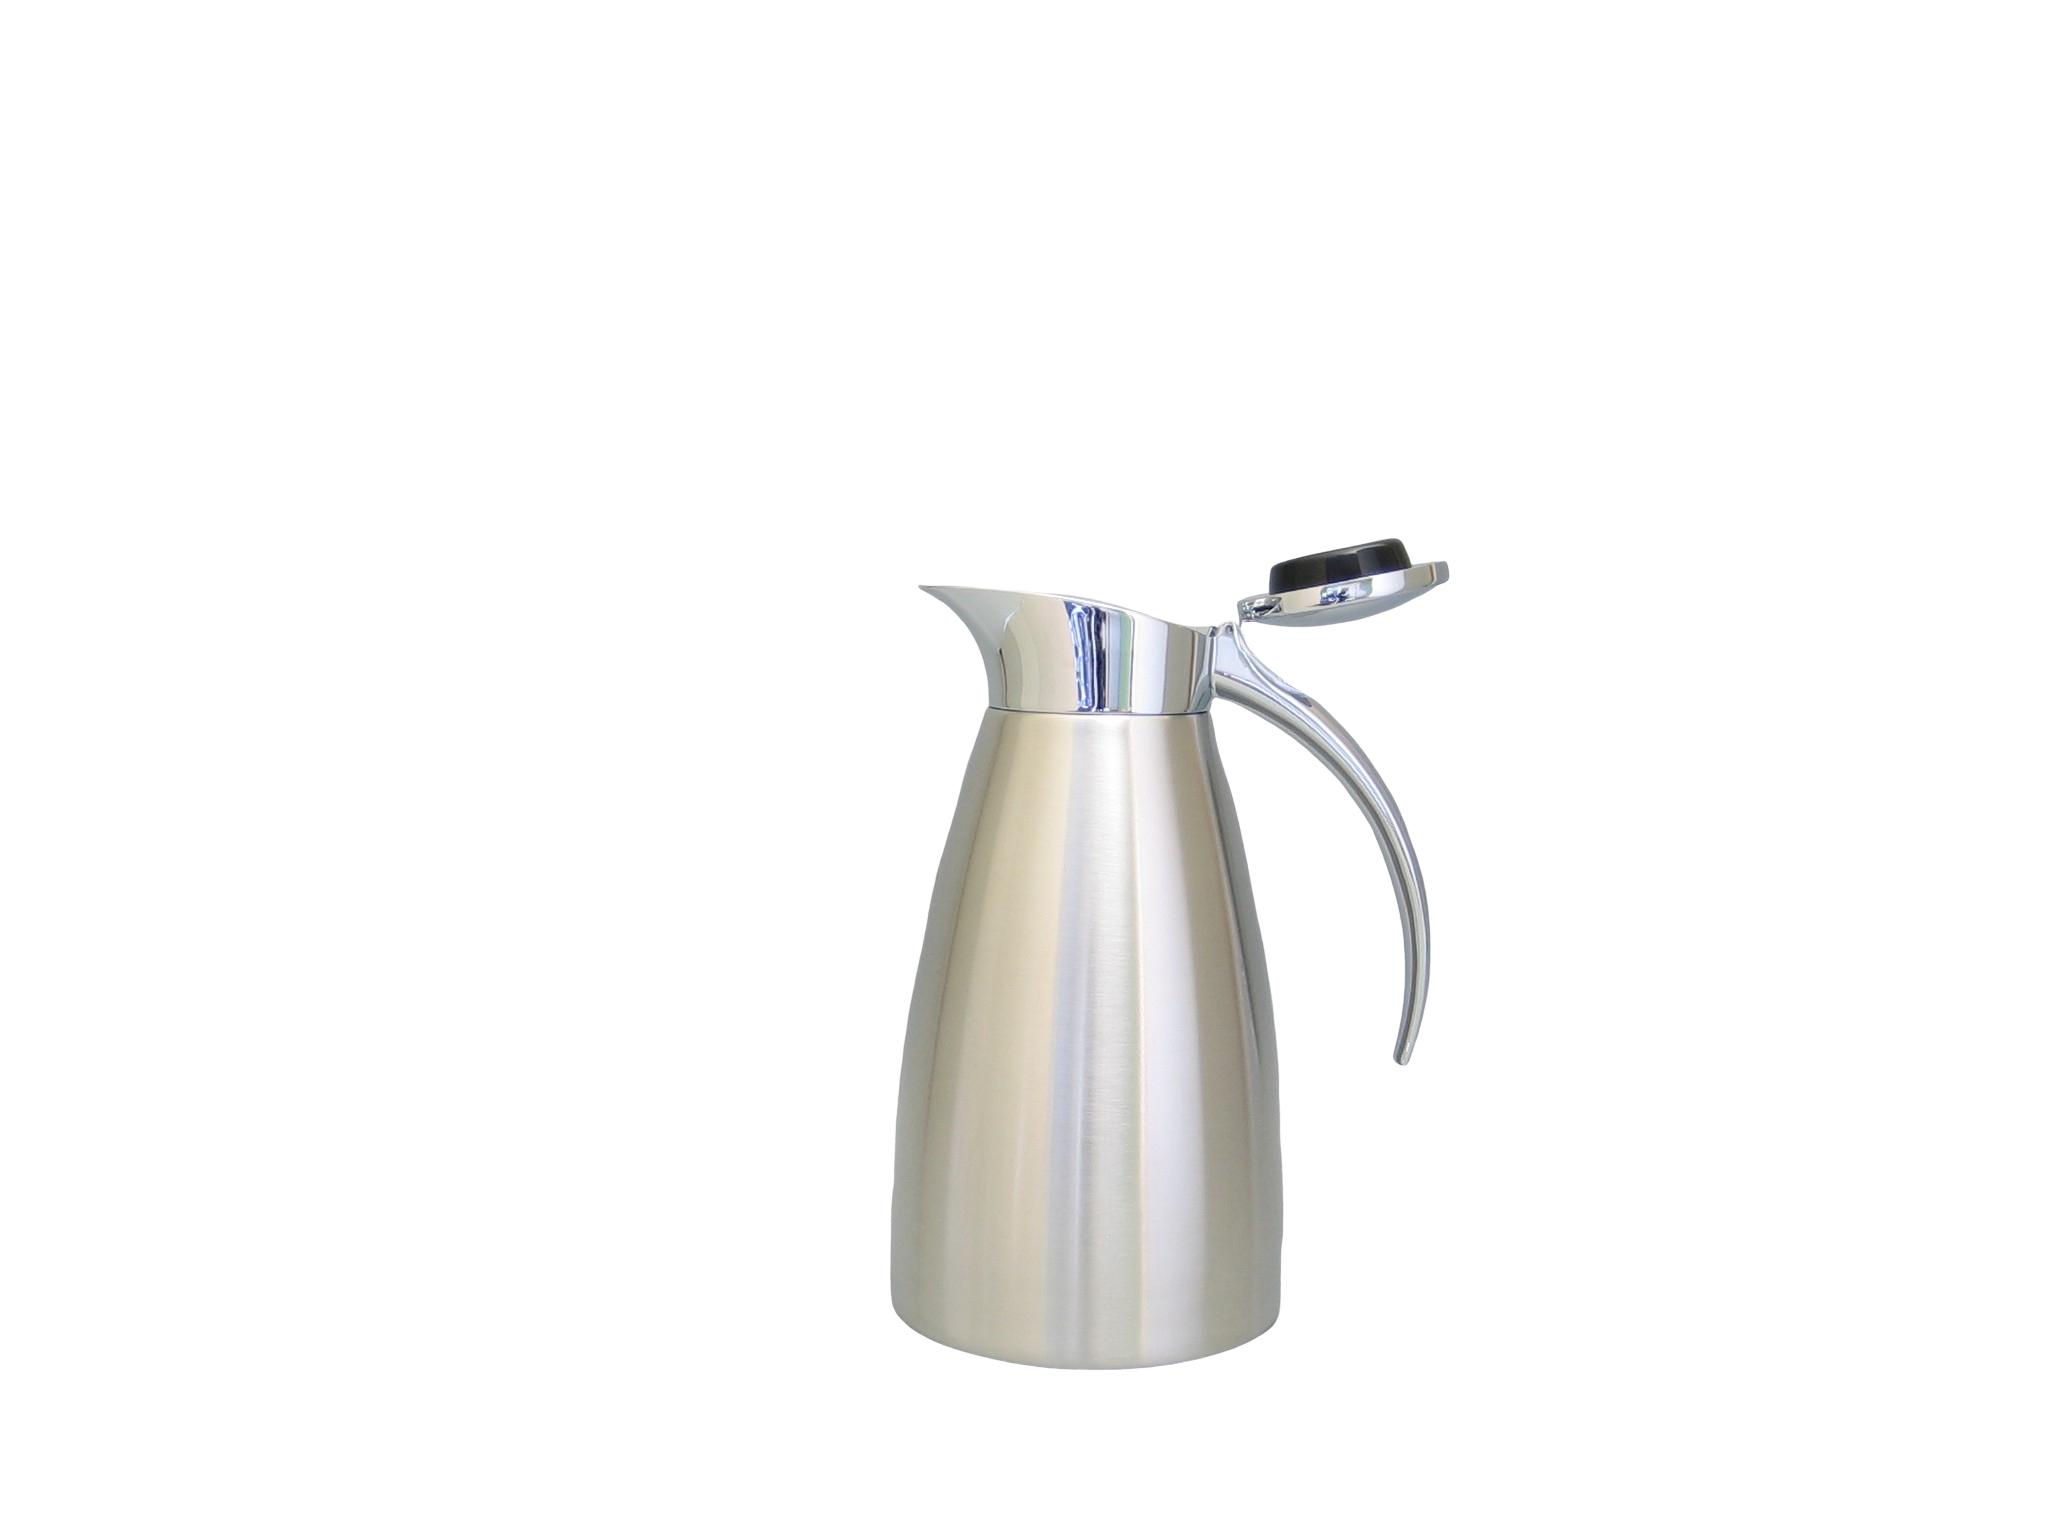 TUNDRA06-900 - Pichet isotherme inox incassable brossé 0.60 L - Isobel